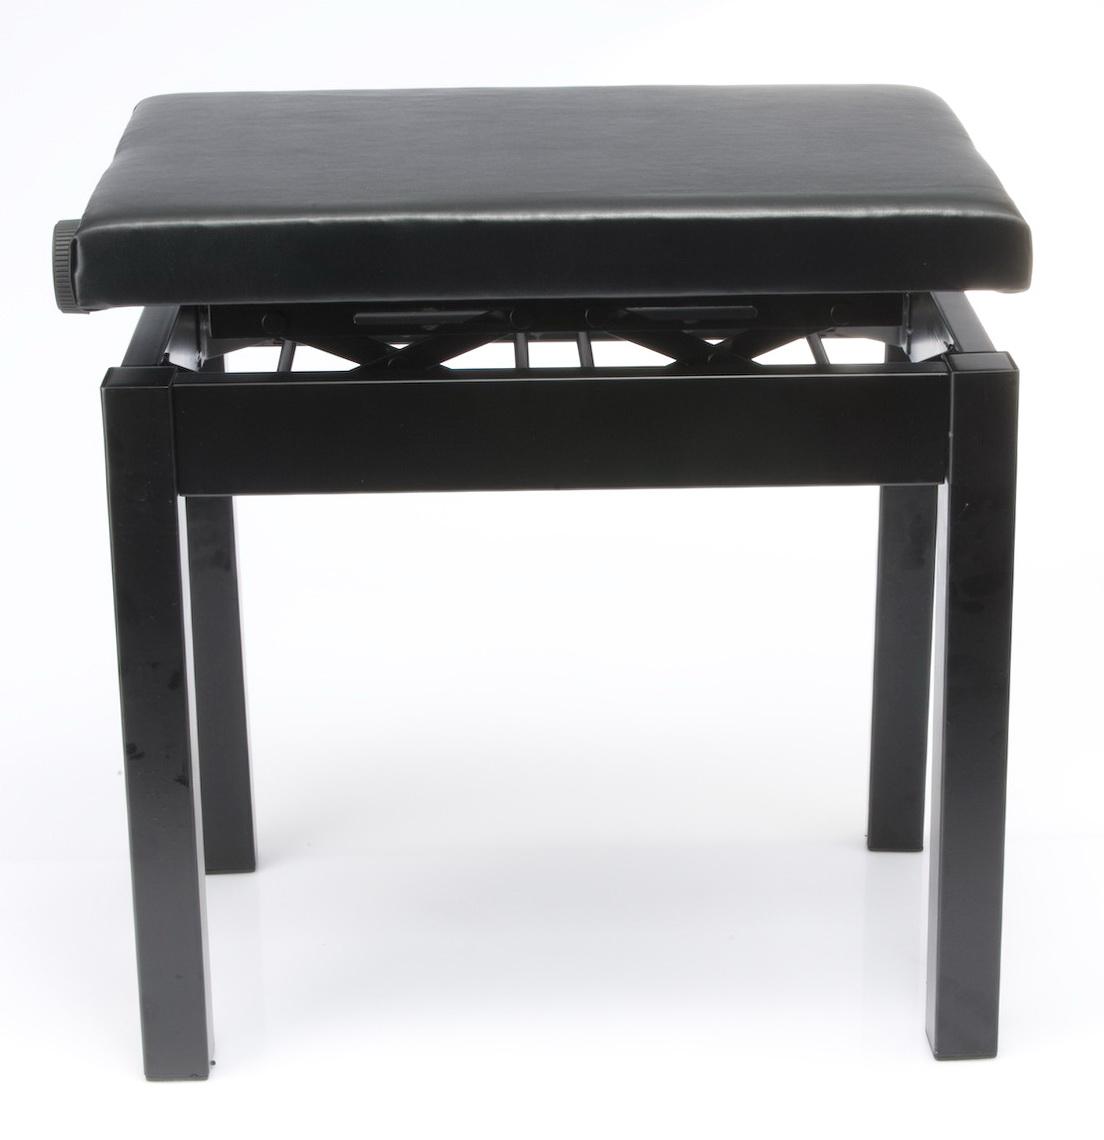 Adjustable Piano Bench Hardware